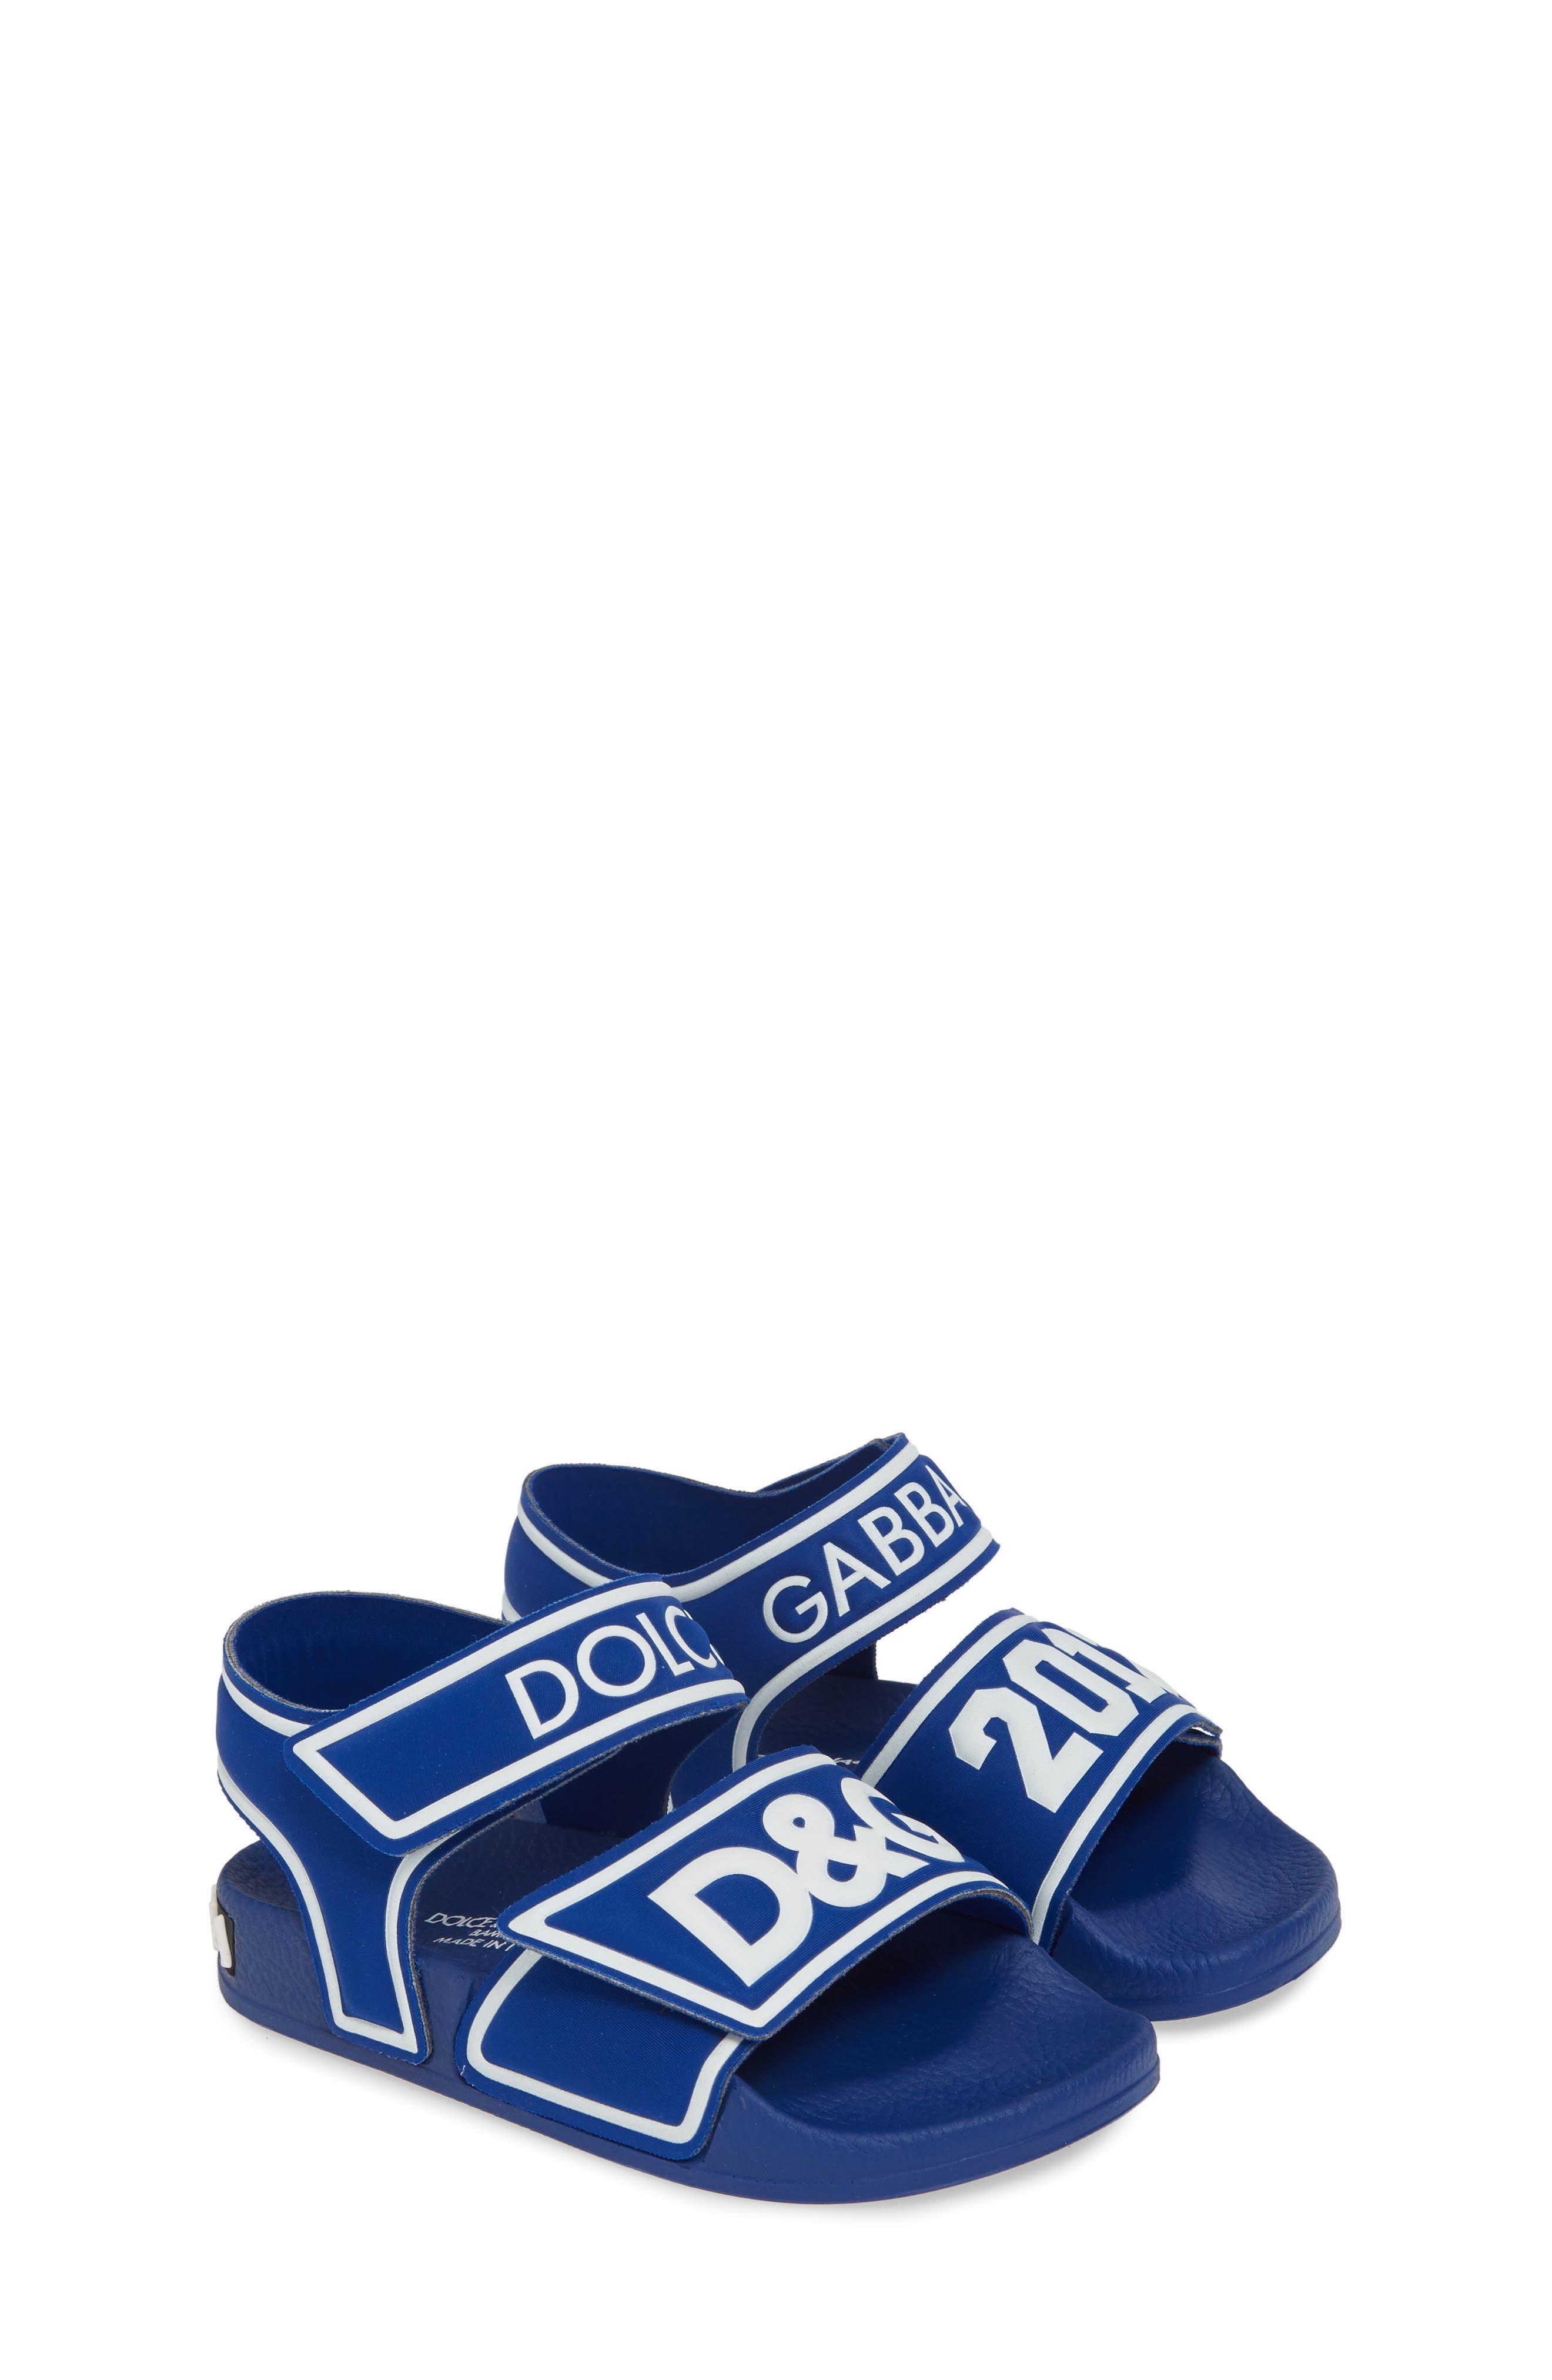 DOLCE&GABBANA, Jelly Fisherman Sandal, Alternate thumbnail 2, color, BLUE/ WHITE